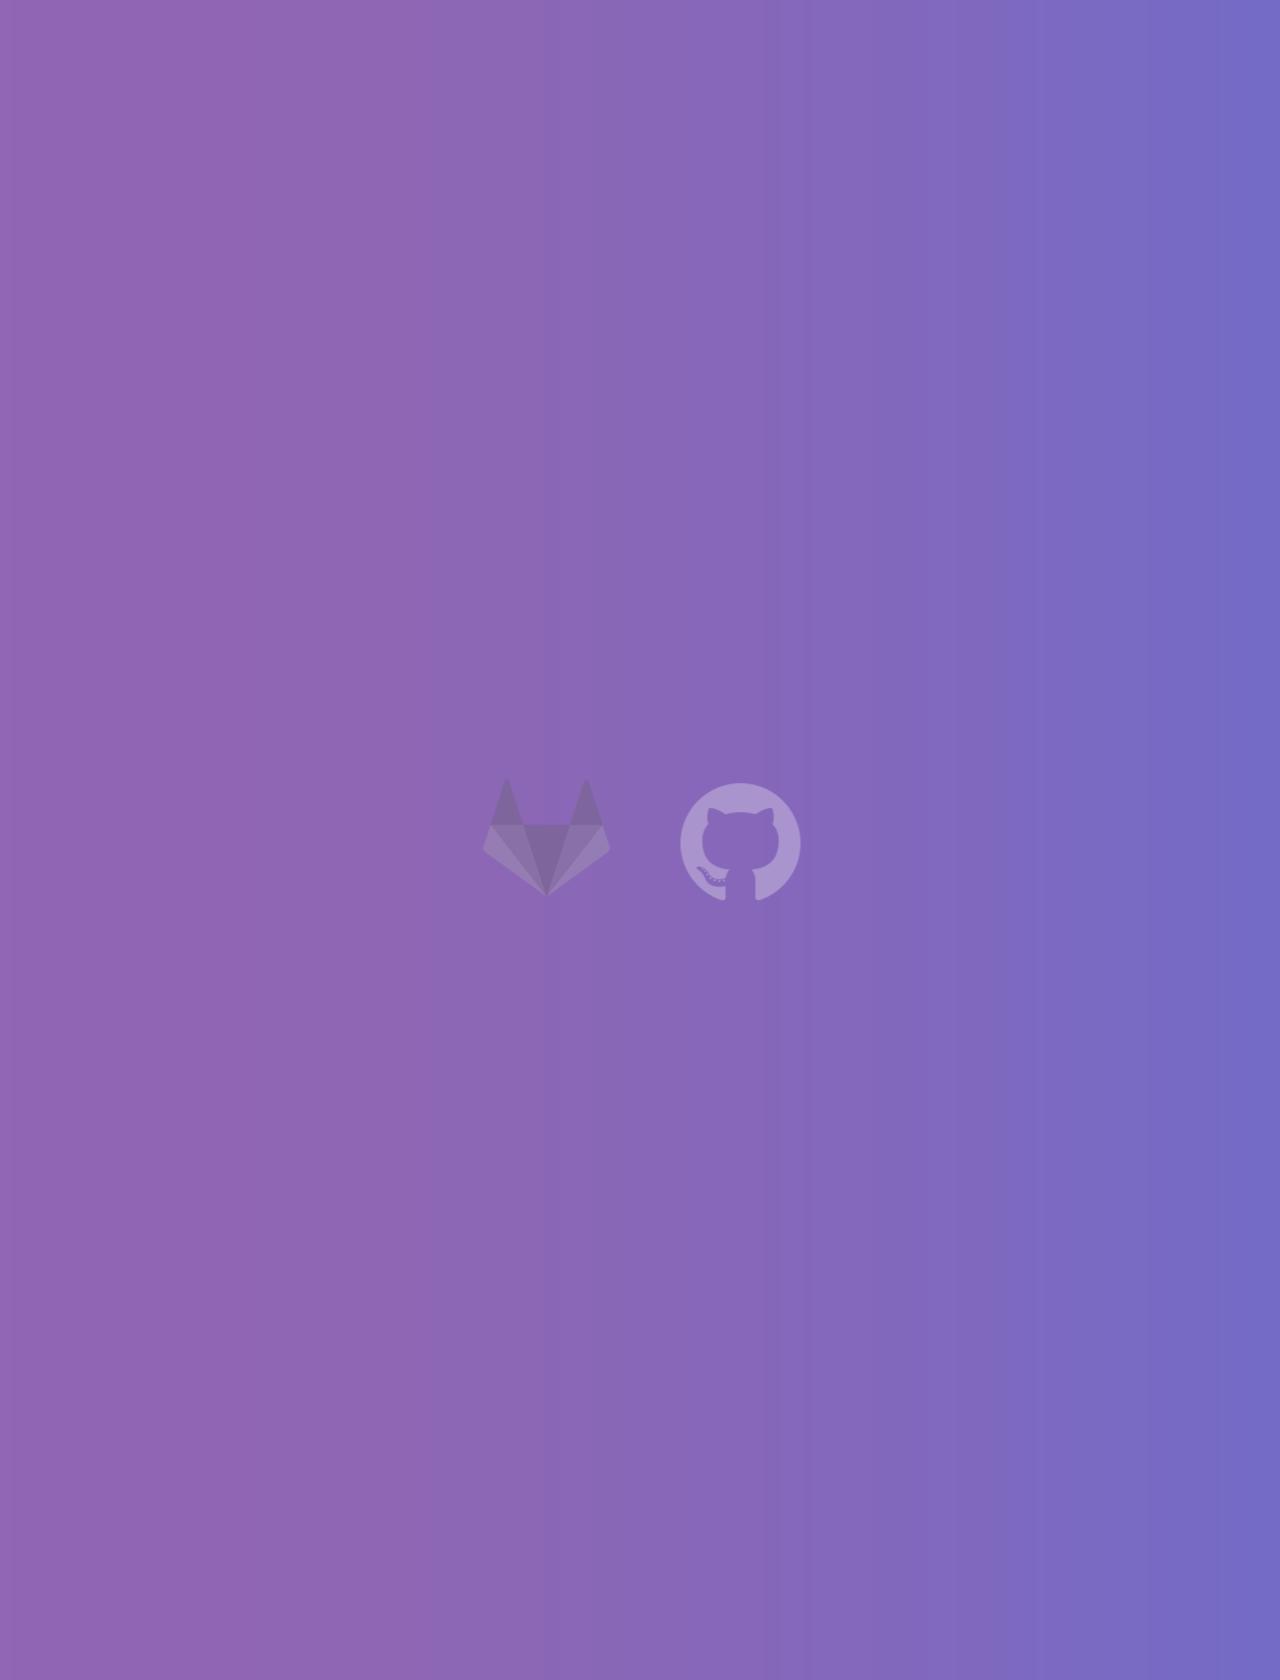 Screenshot Desktop - https://ivnk.dev/